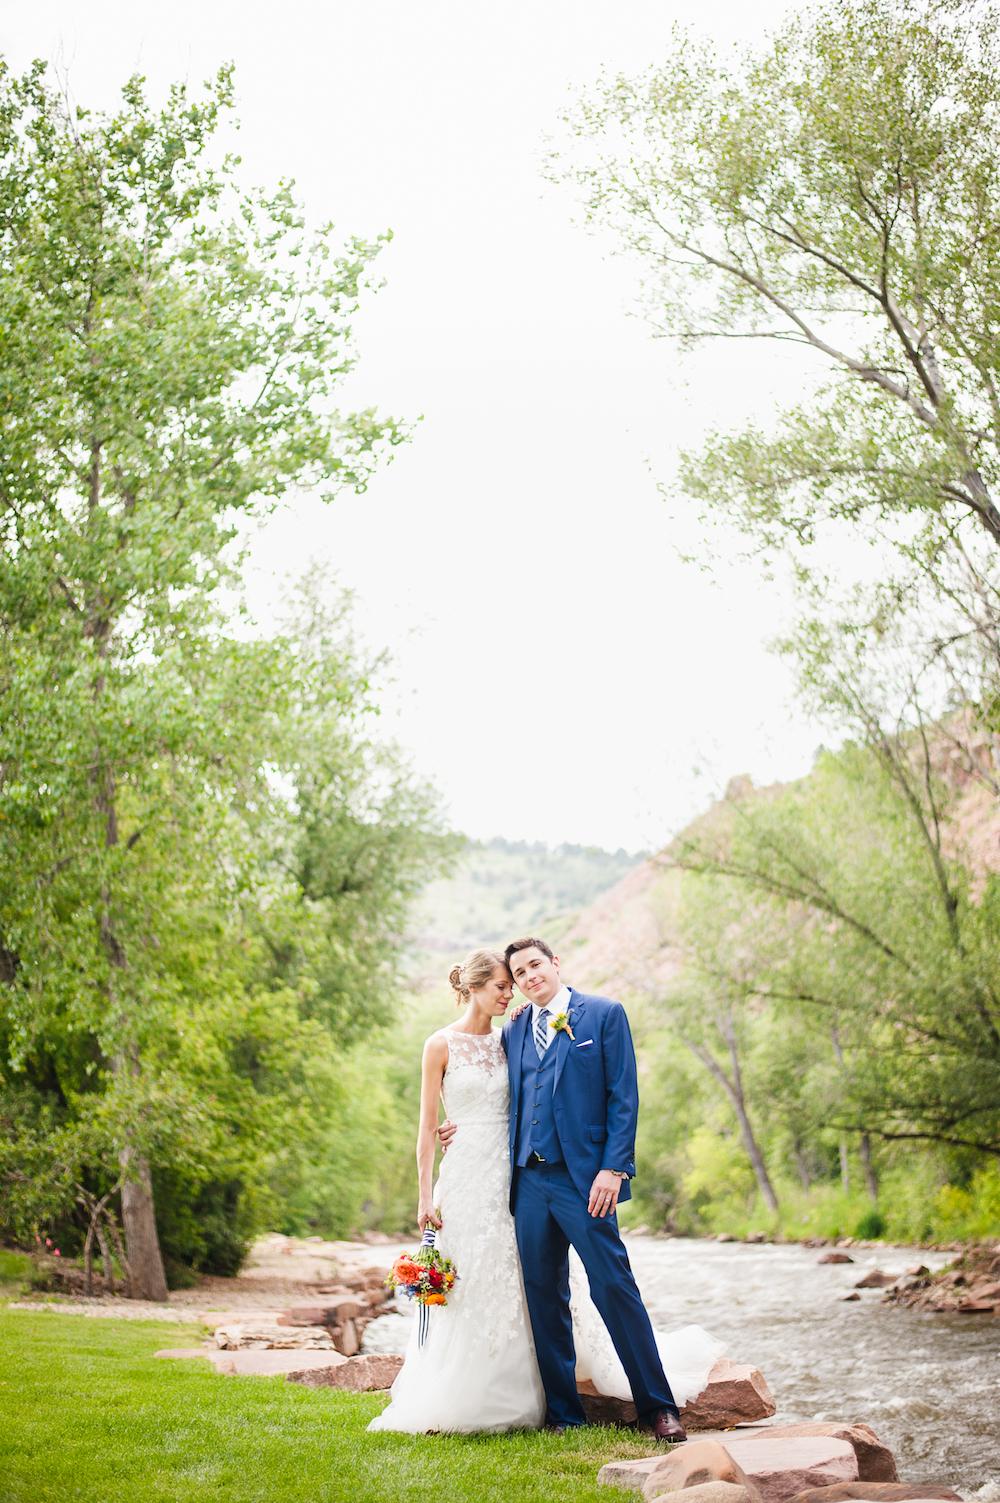 ck-Engagement-Colorado-0007.jpg